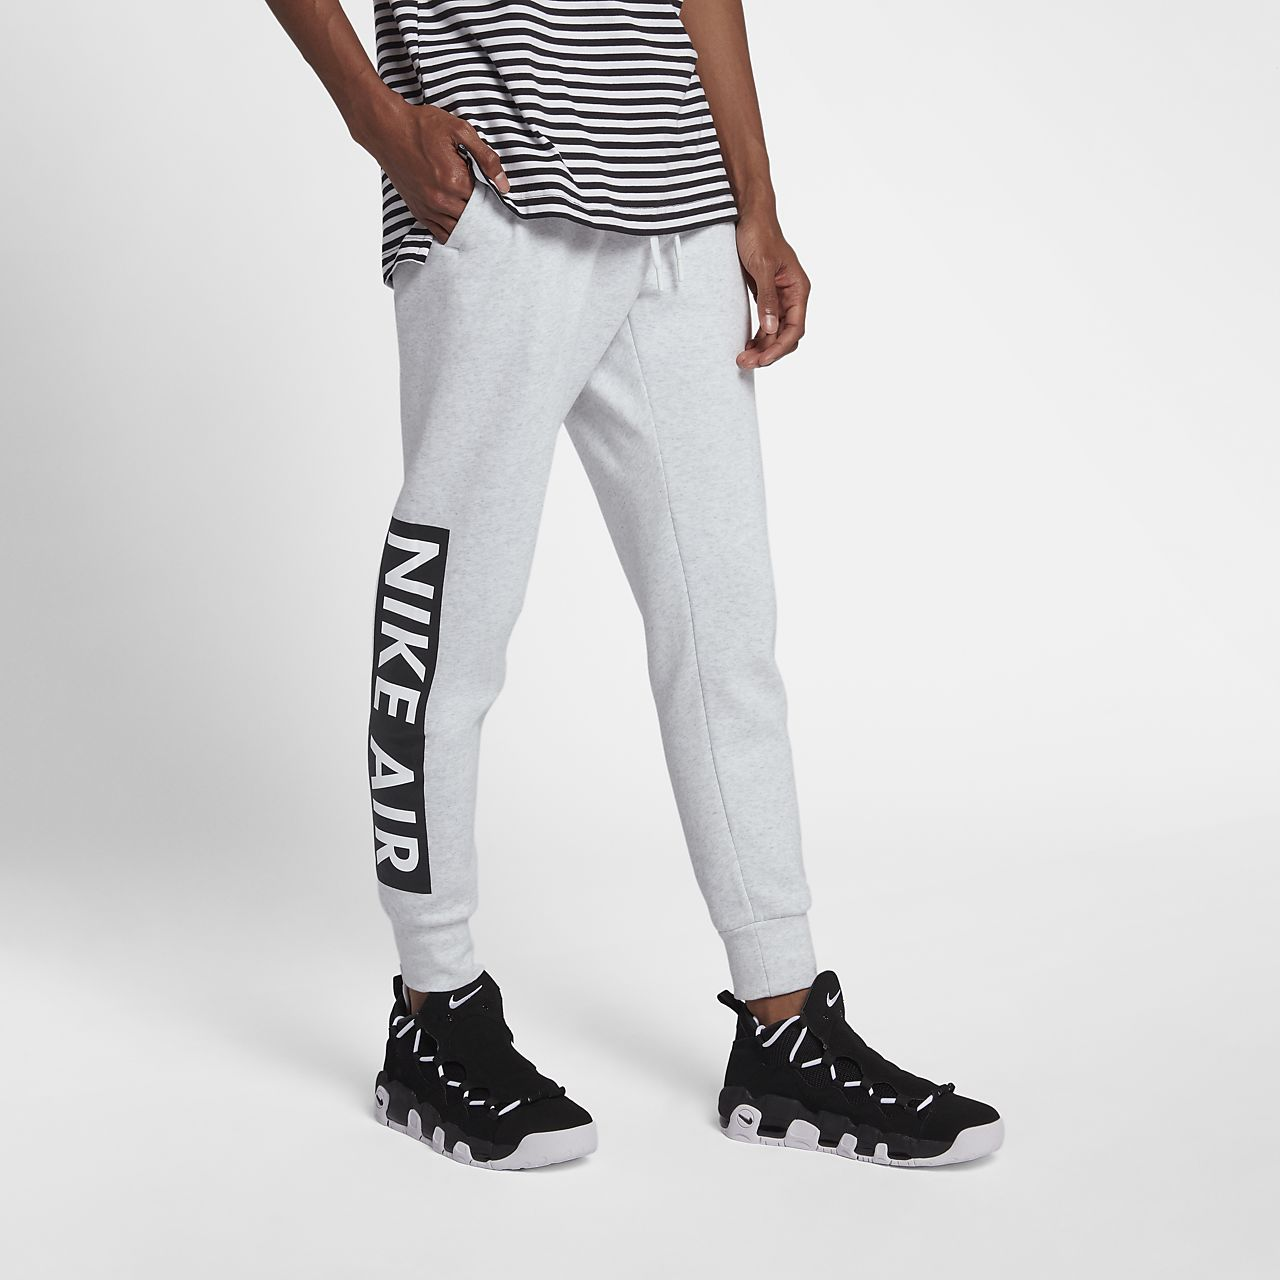 Pour Ca Fleece Nike Tissu Homme En Pantalon Air qg7Rnw